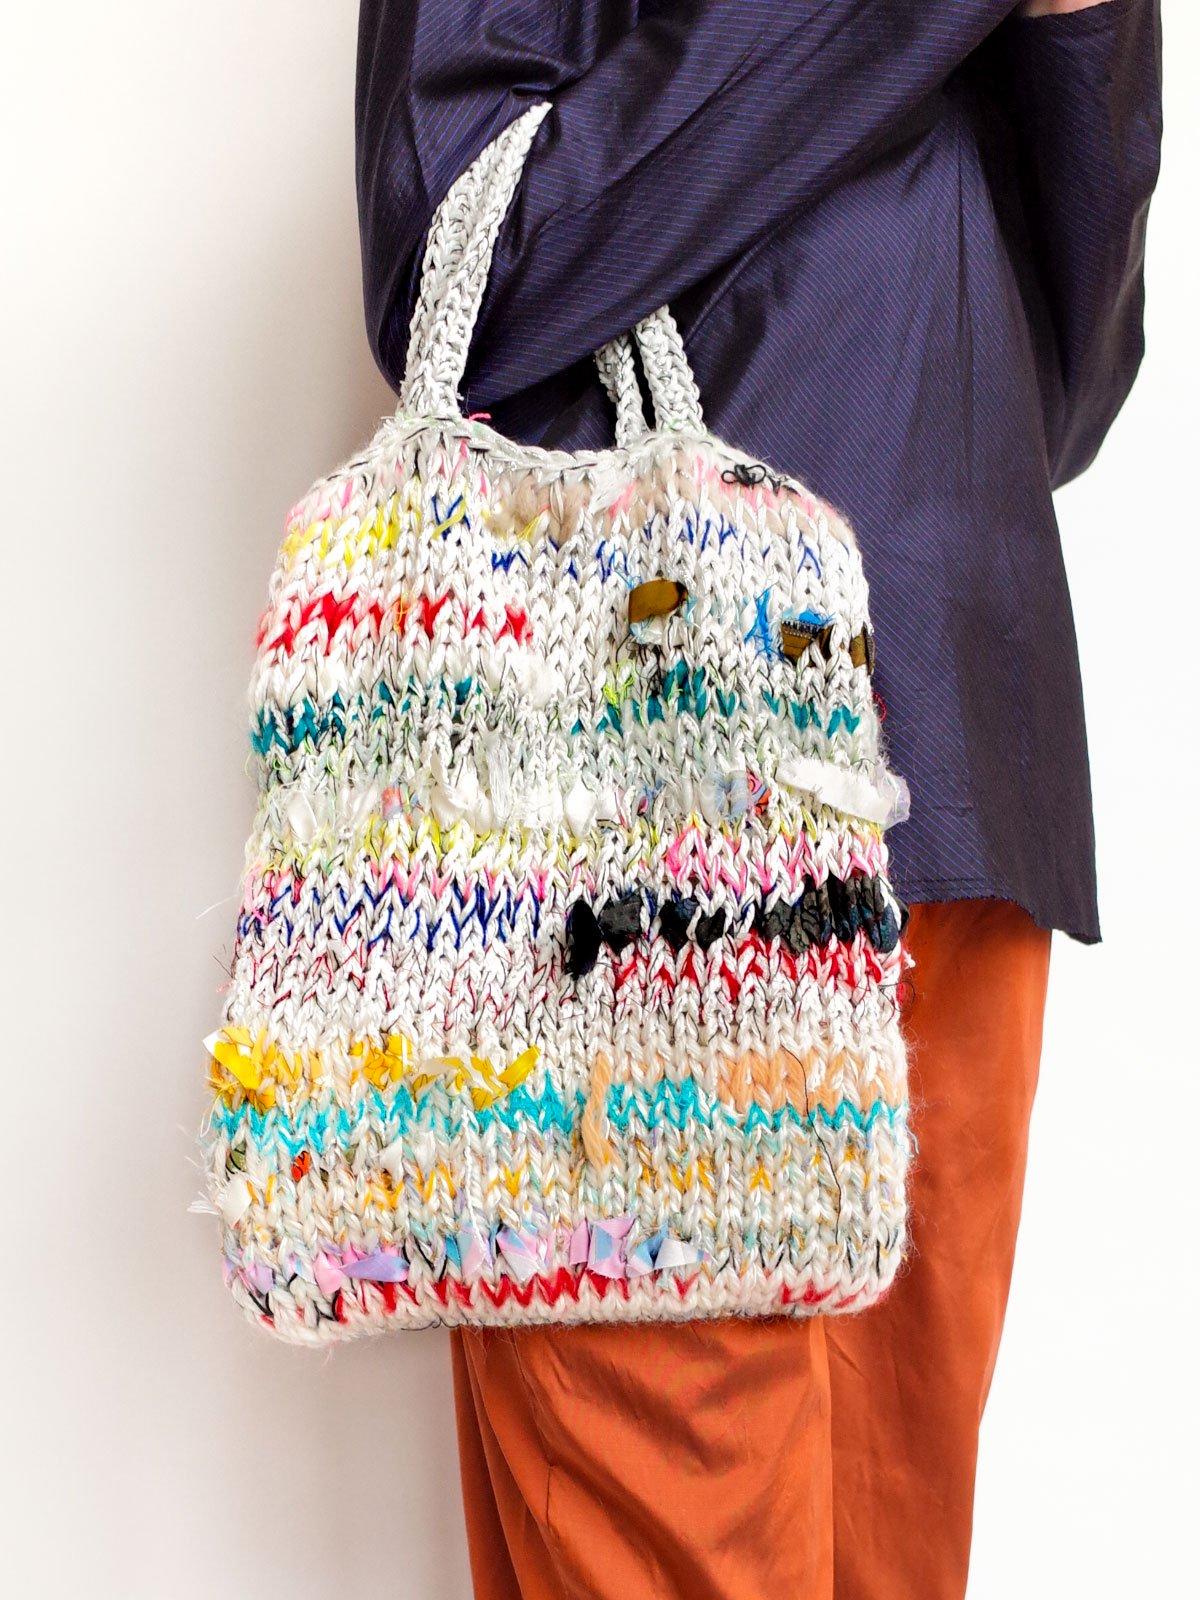 ari × mamarobot / Knit Bag / white